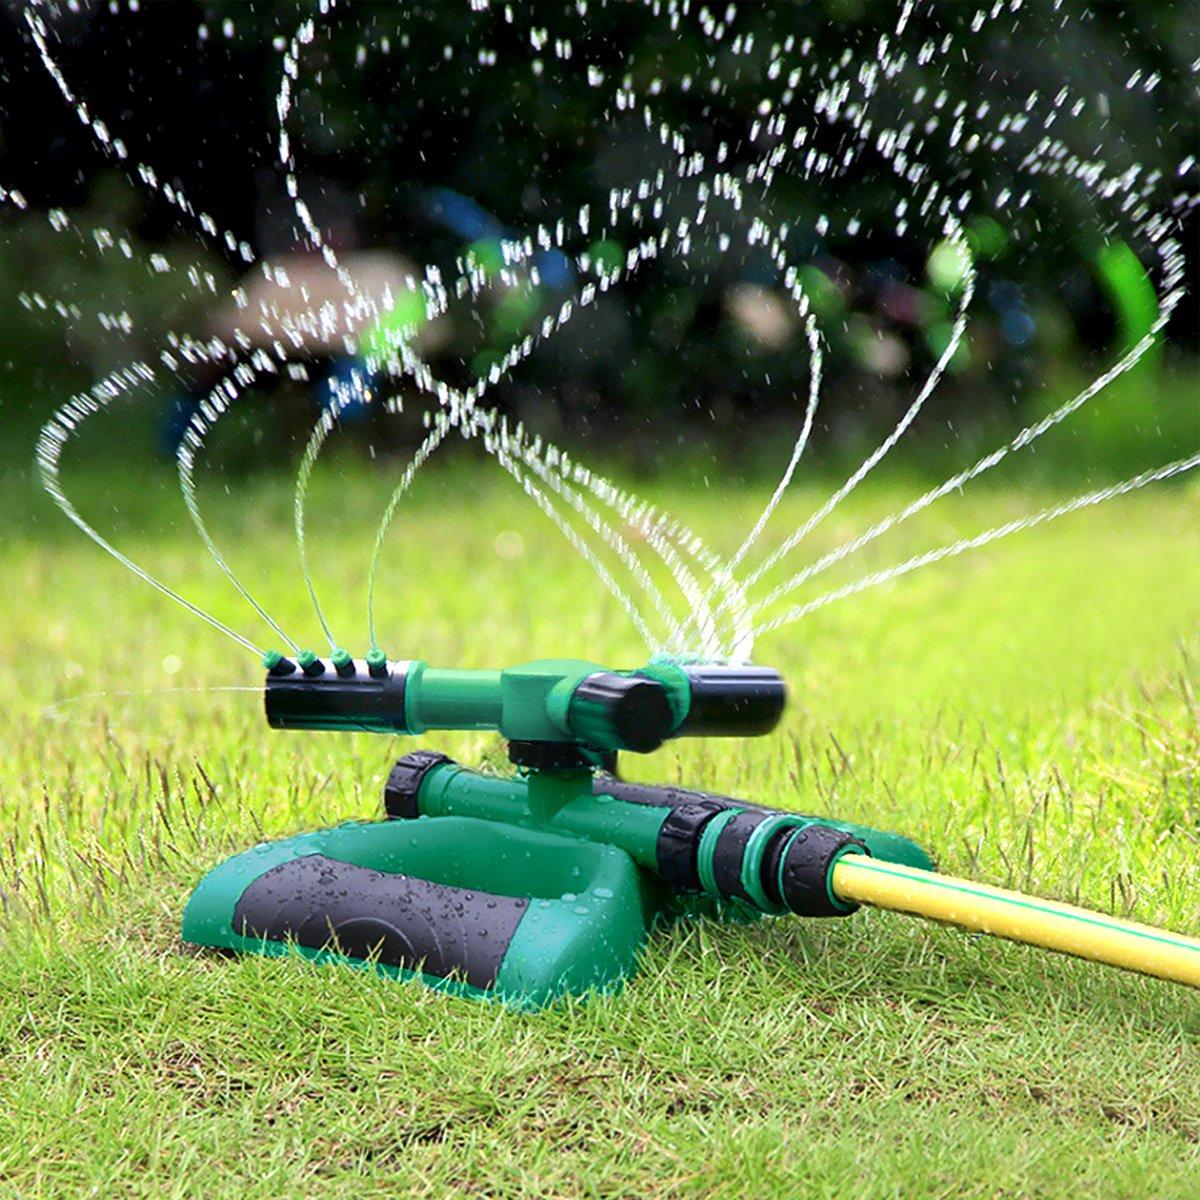 Homeme Garden Sprinkler, Automatic 360° Rotating Water Sprinkler with 3 Arm Round Sprayer for Gardens & Lawns Irrigation